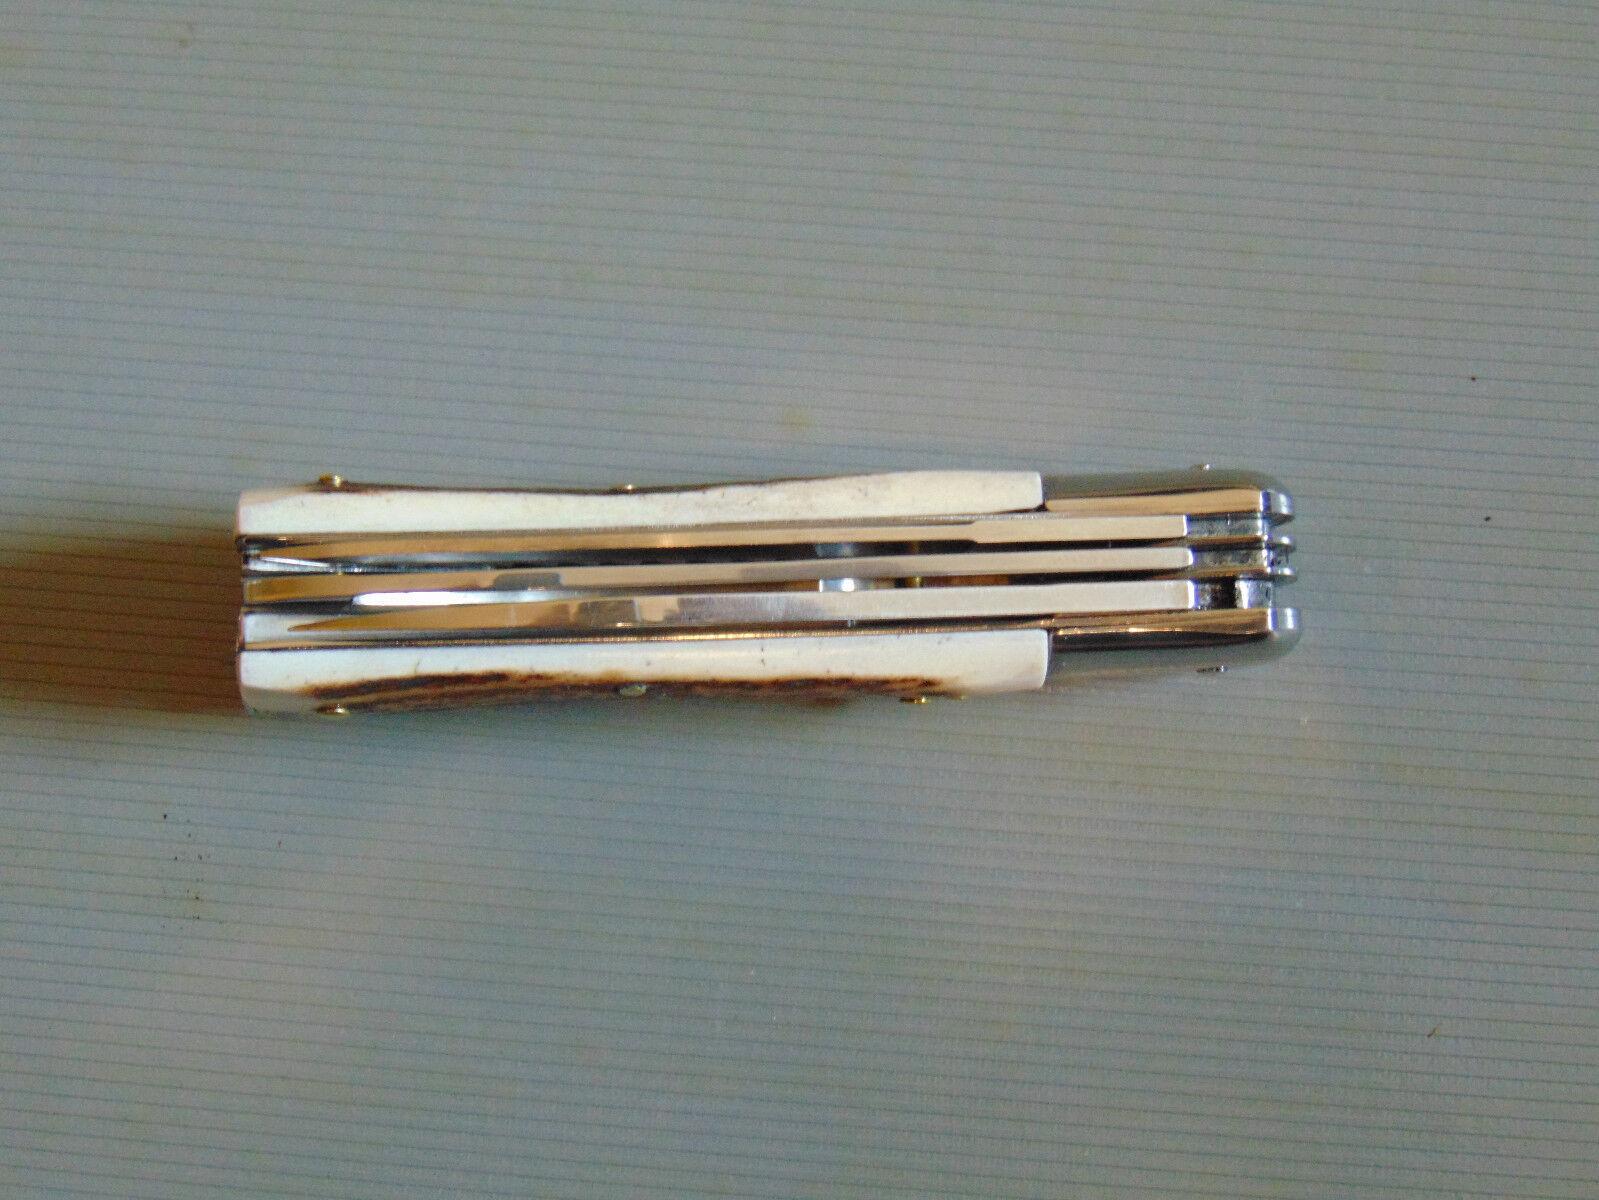 Klappmesser Taschenmesser Taschenmesser Klappmesser Herbertz Jagd-Taschenmesser, 4-teilig, Stahl 1.4116, H 59ff60